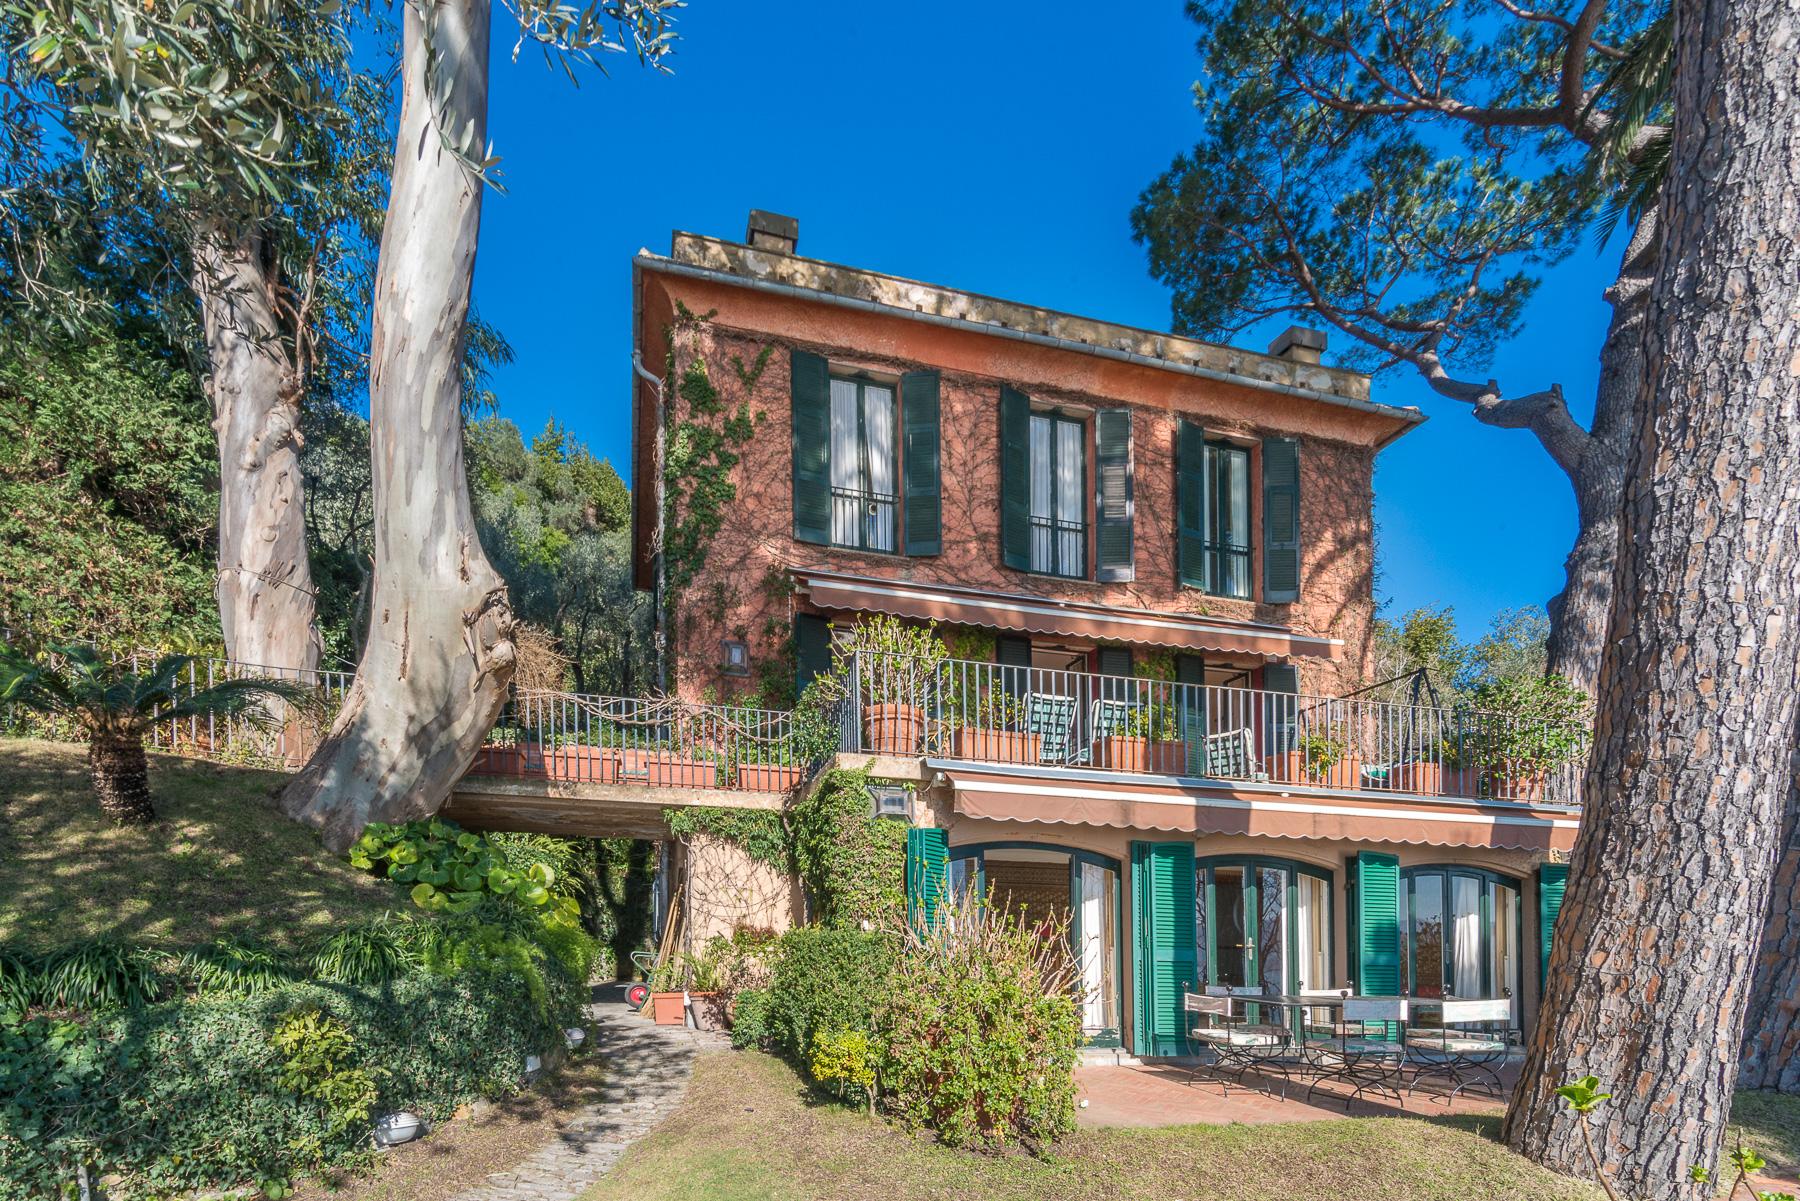 Villa in Vendita a Santa Margherita Ligure: 5 locali, 440 mq - Foto 18